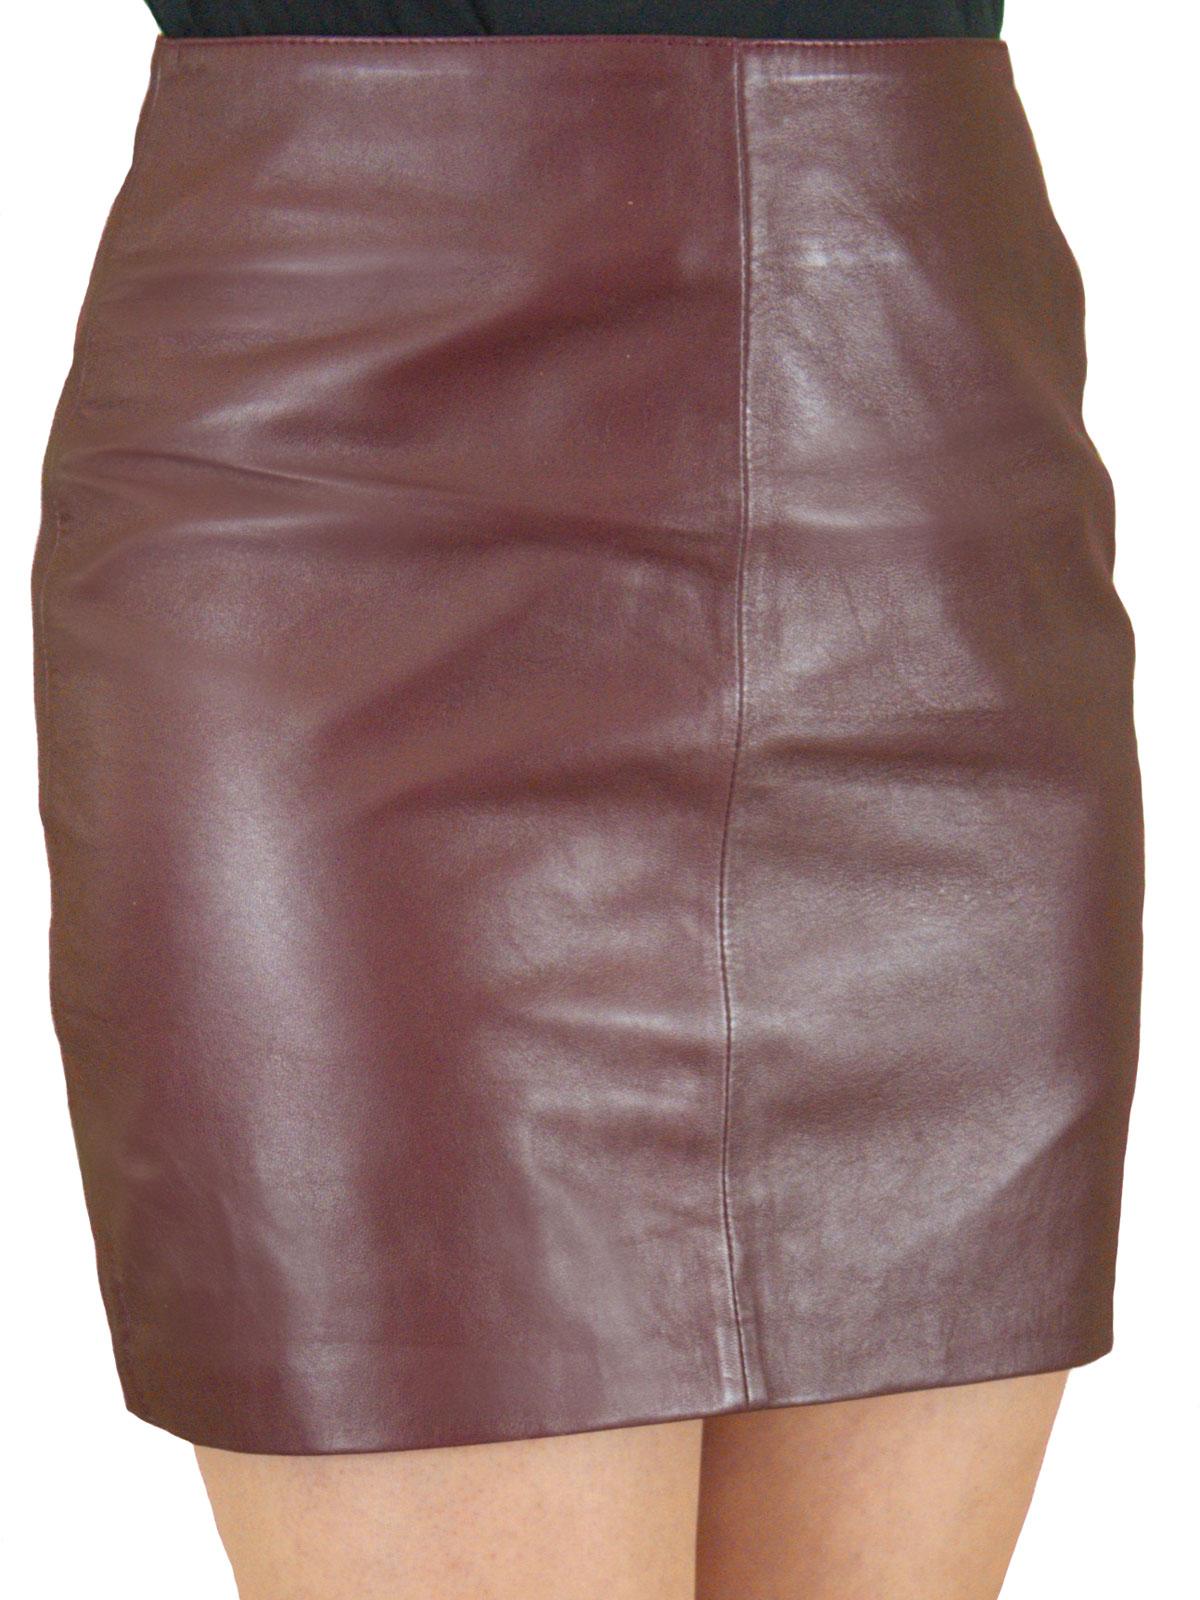 3d13b60e84 Luxury Soft Leather Mini Skirt - chic classic style - Tout Ensemble …